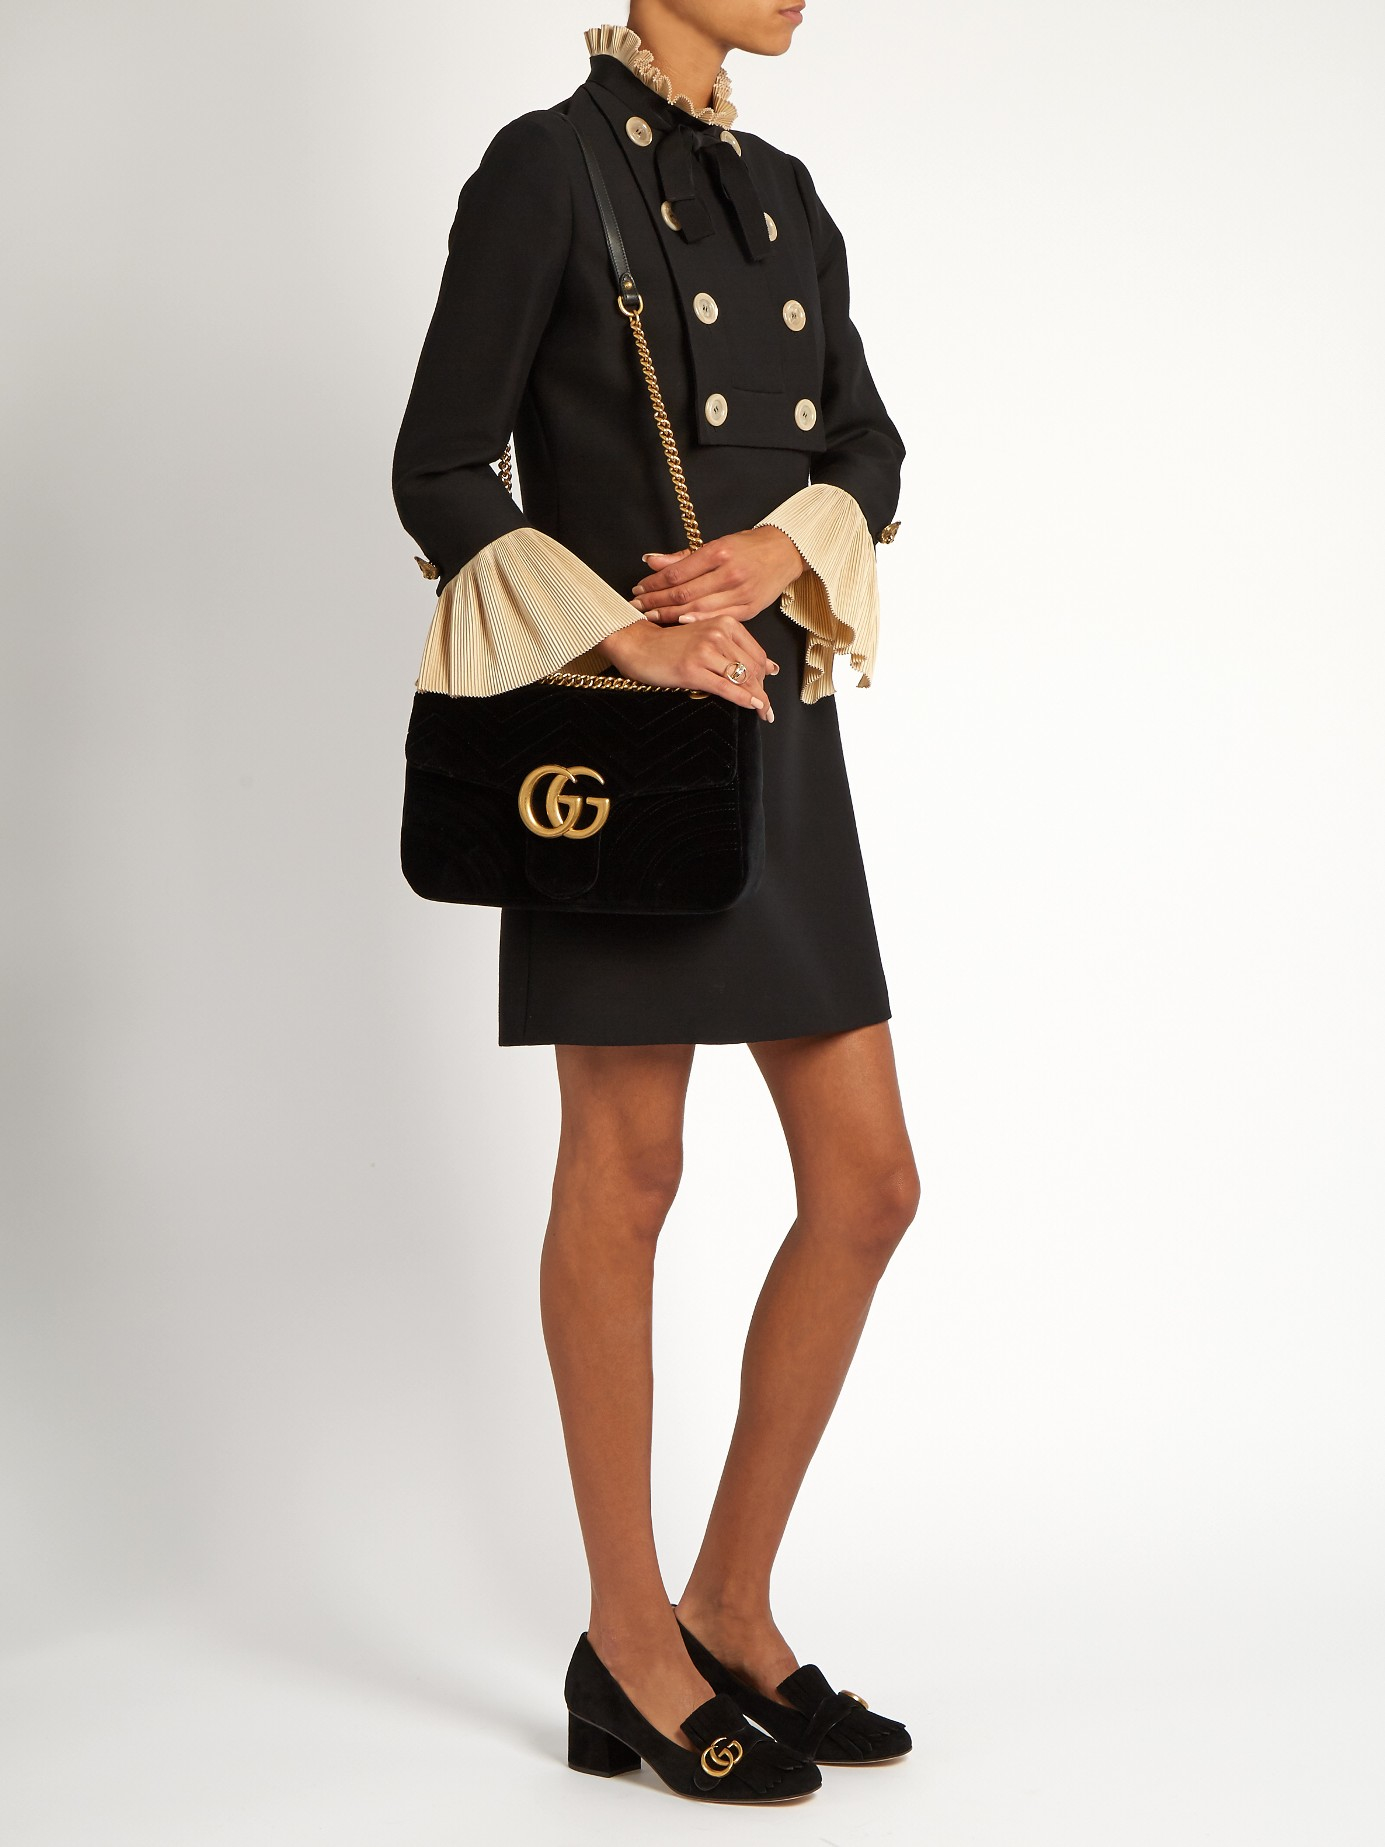 Gucci Gg Marmont Chevron Velvet Shoulder Bag In Black Lyst